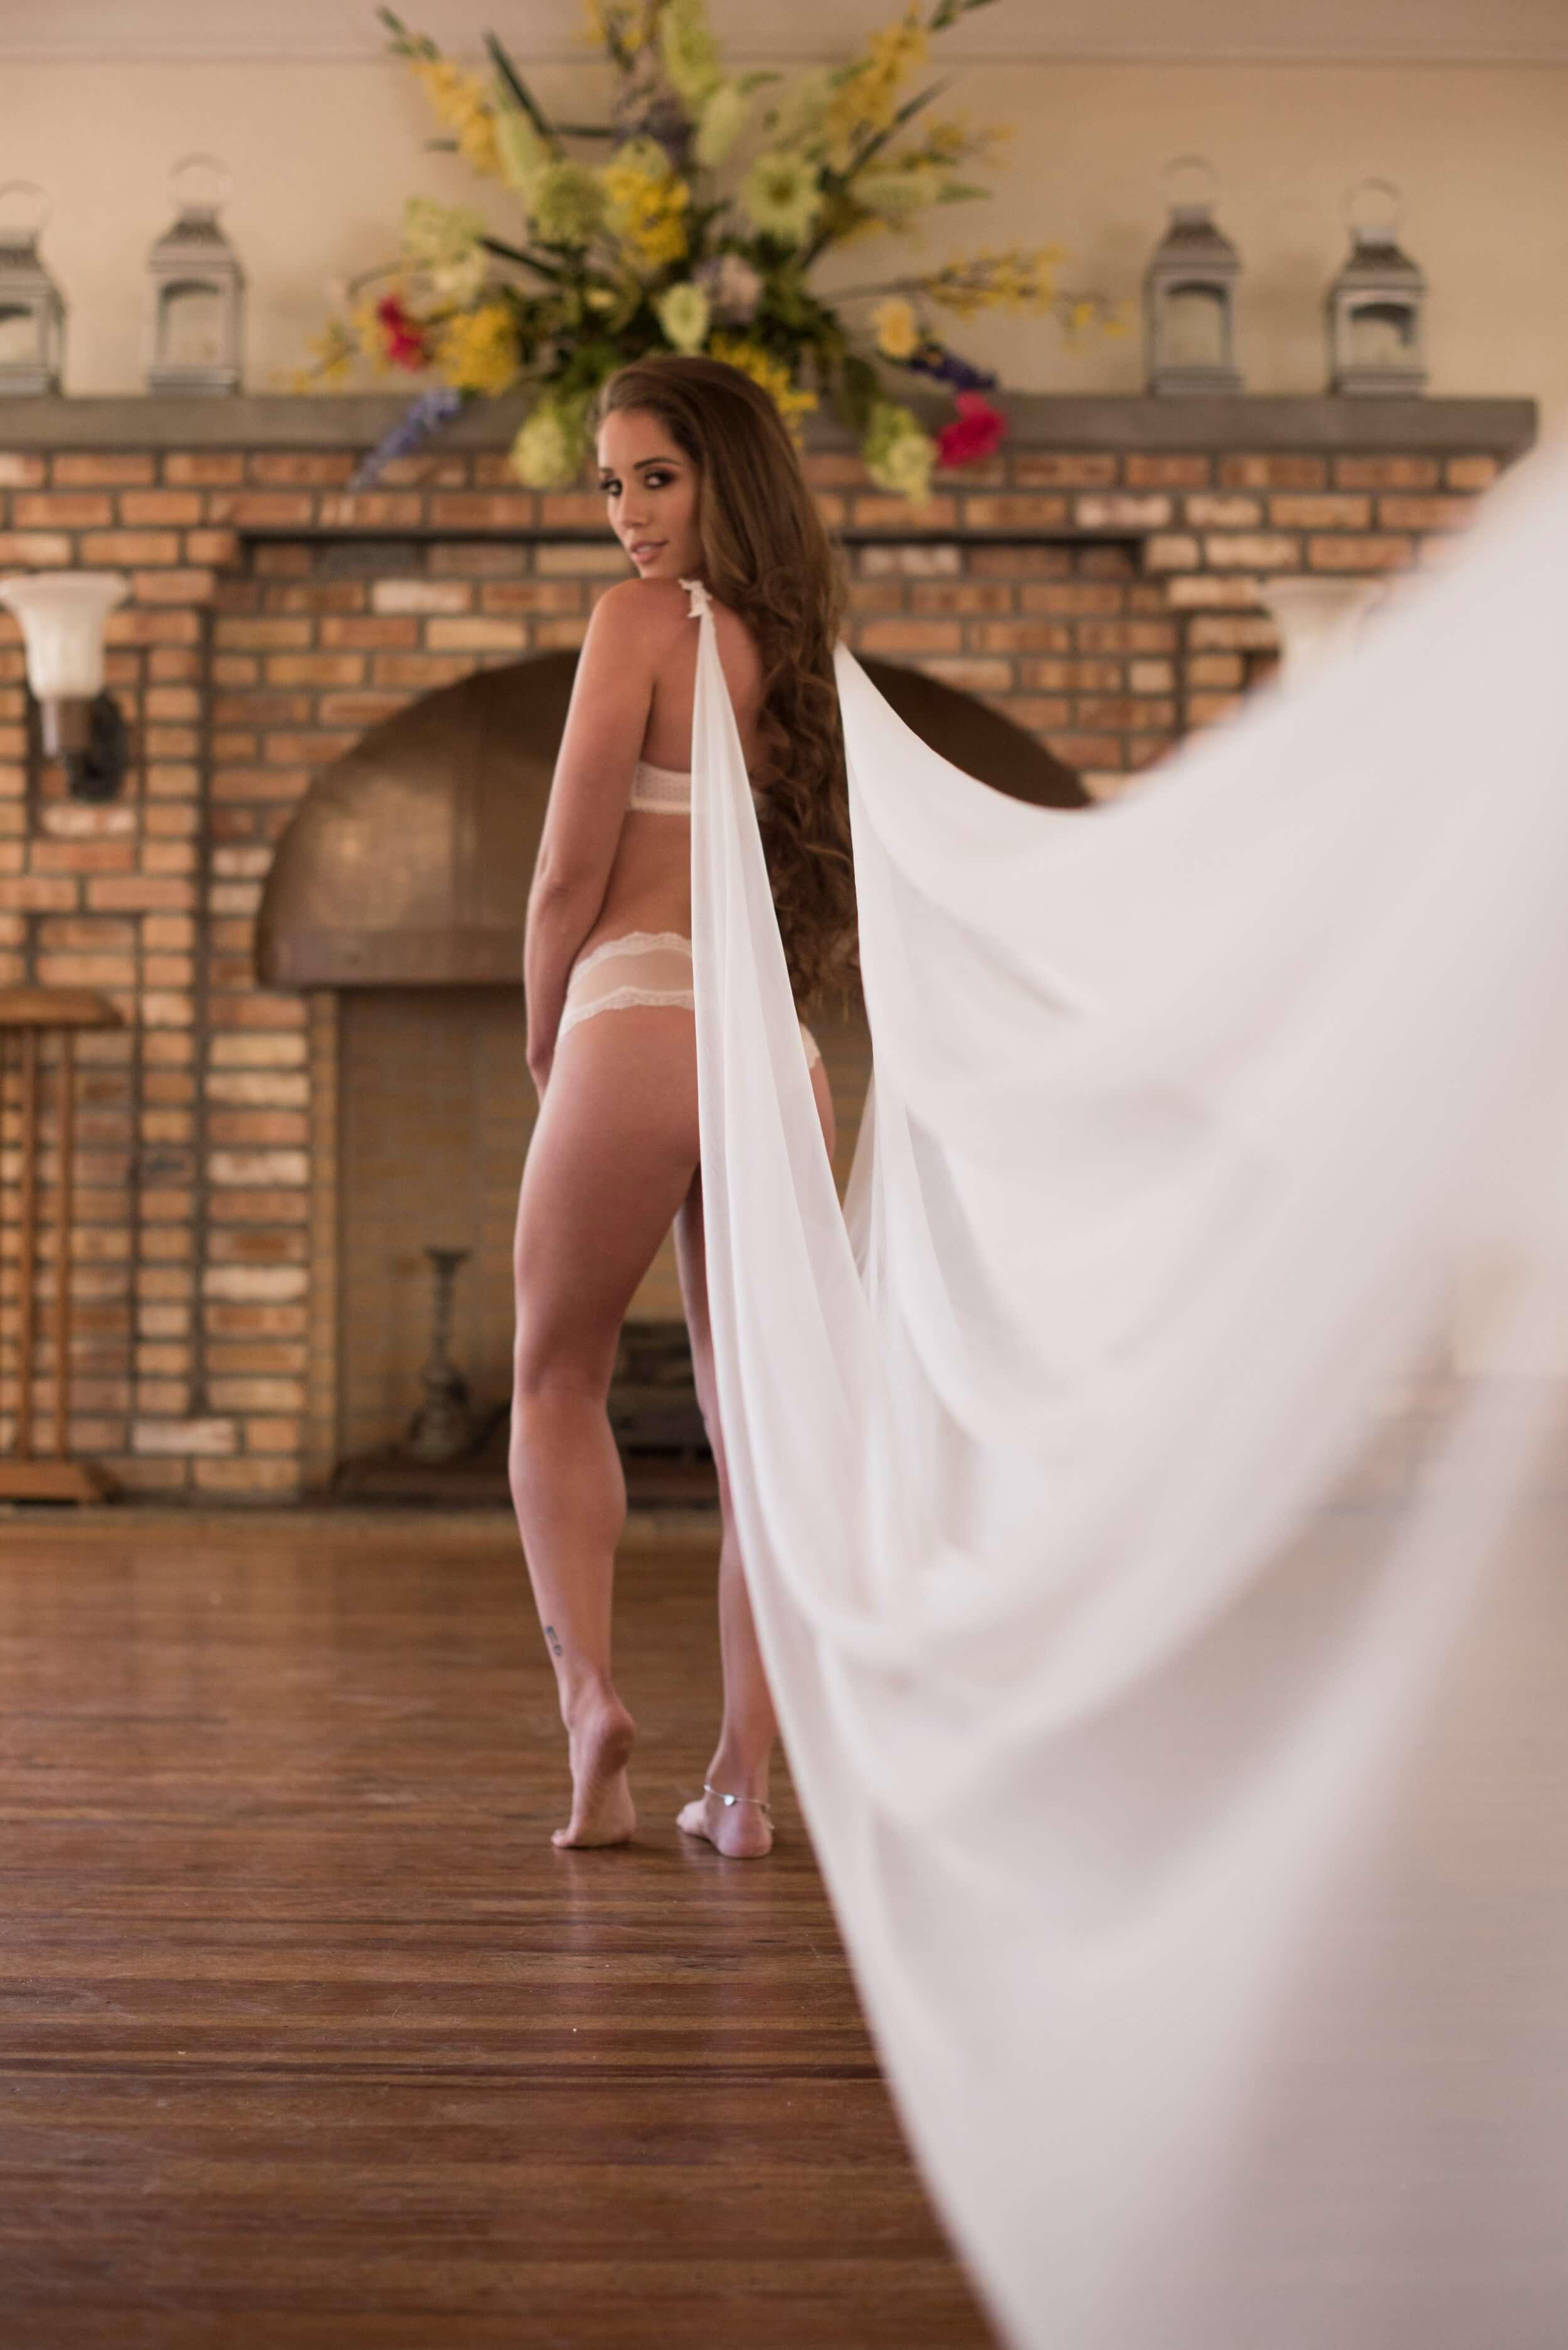 Bridal Boudoir by Graciela Valdes Photography (16).jpg